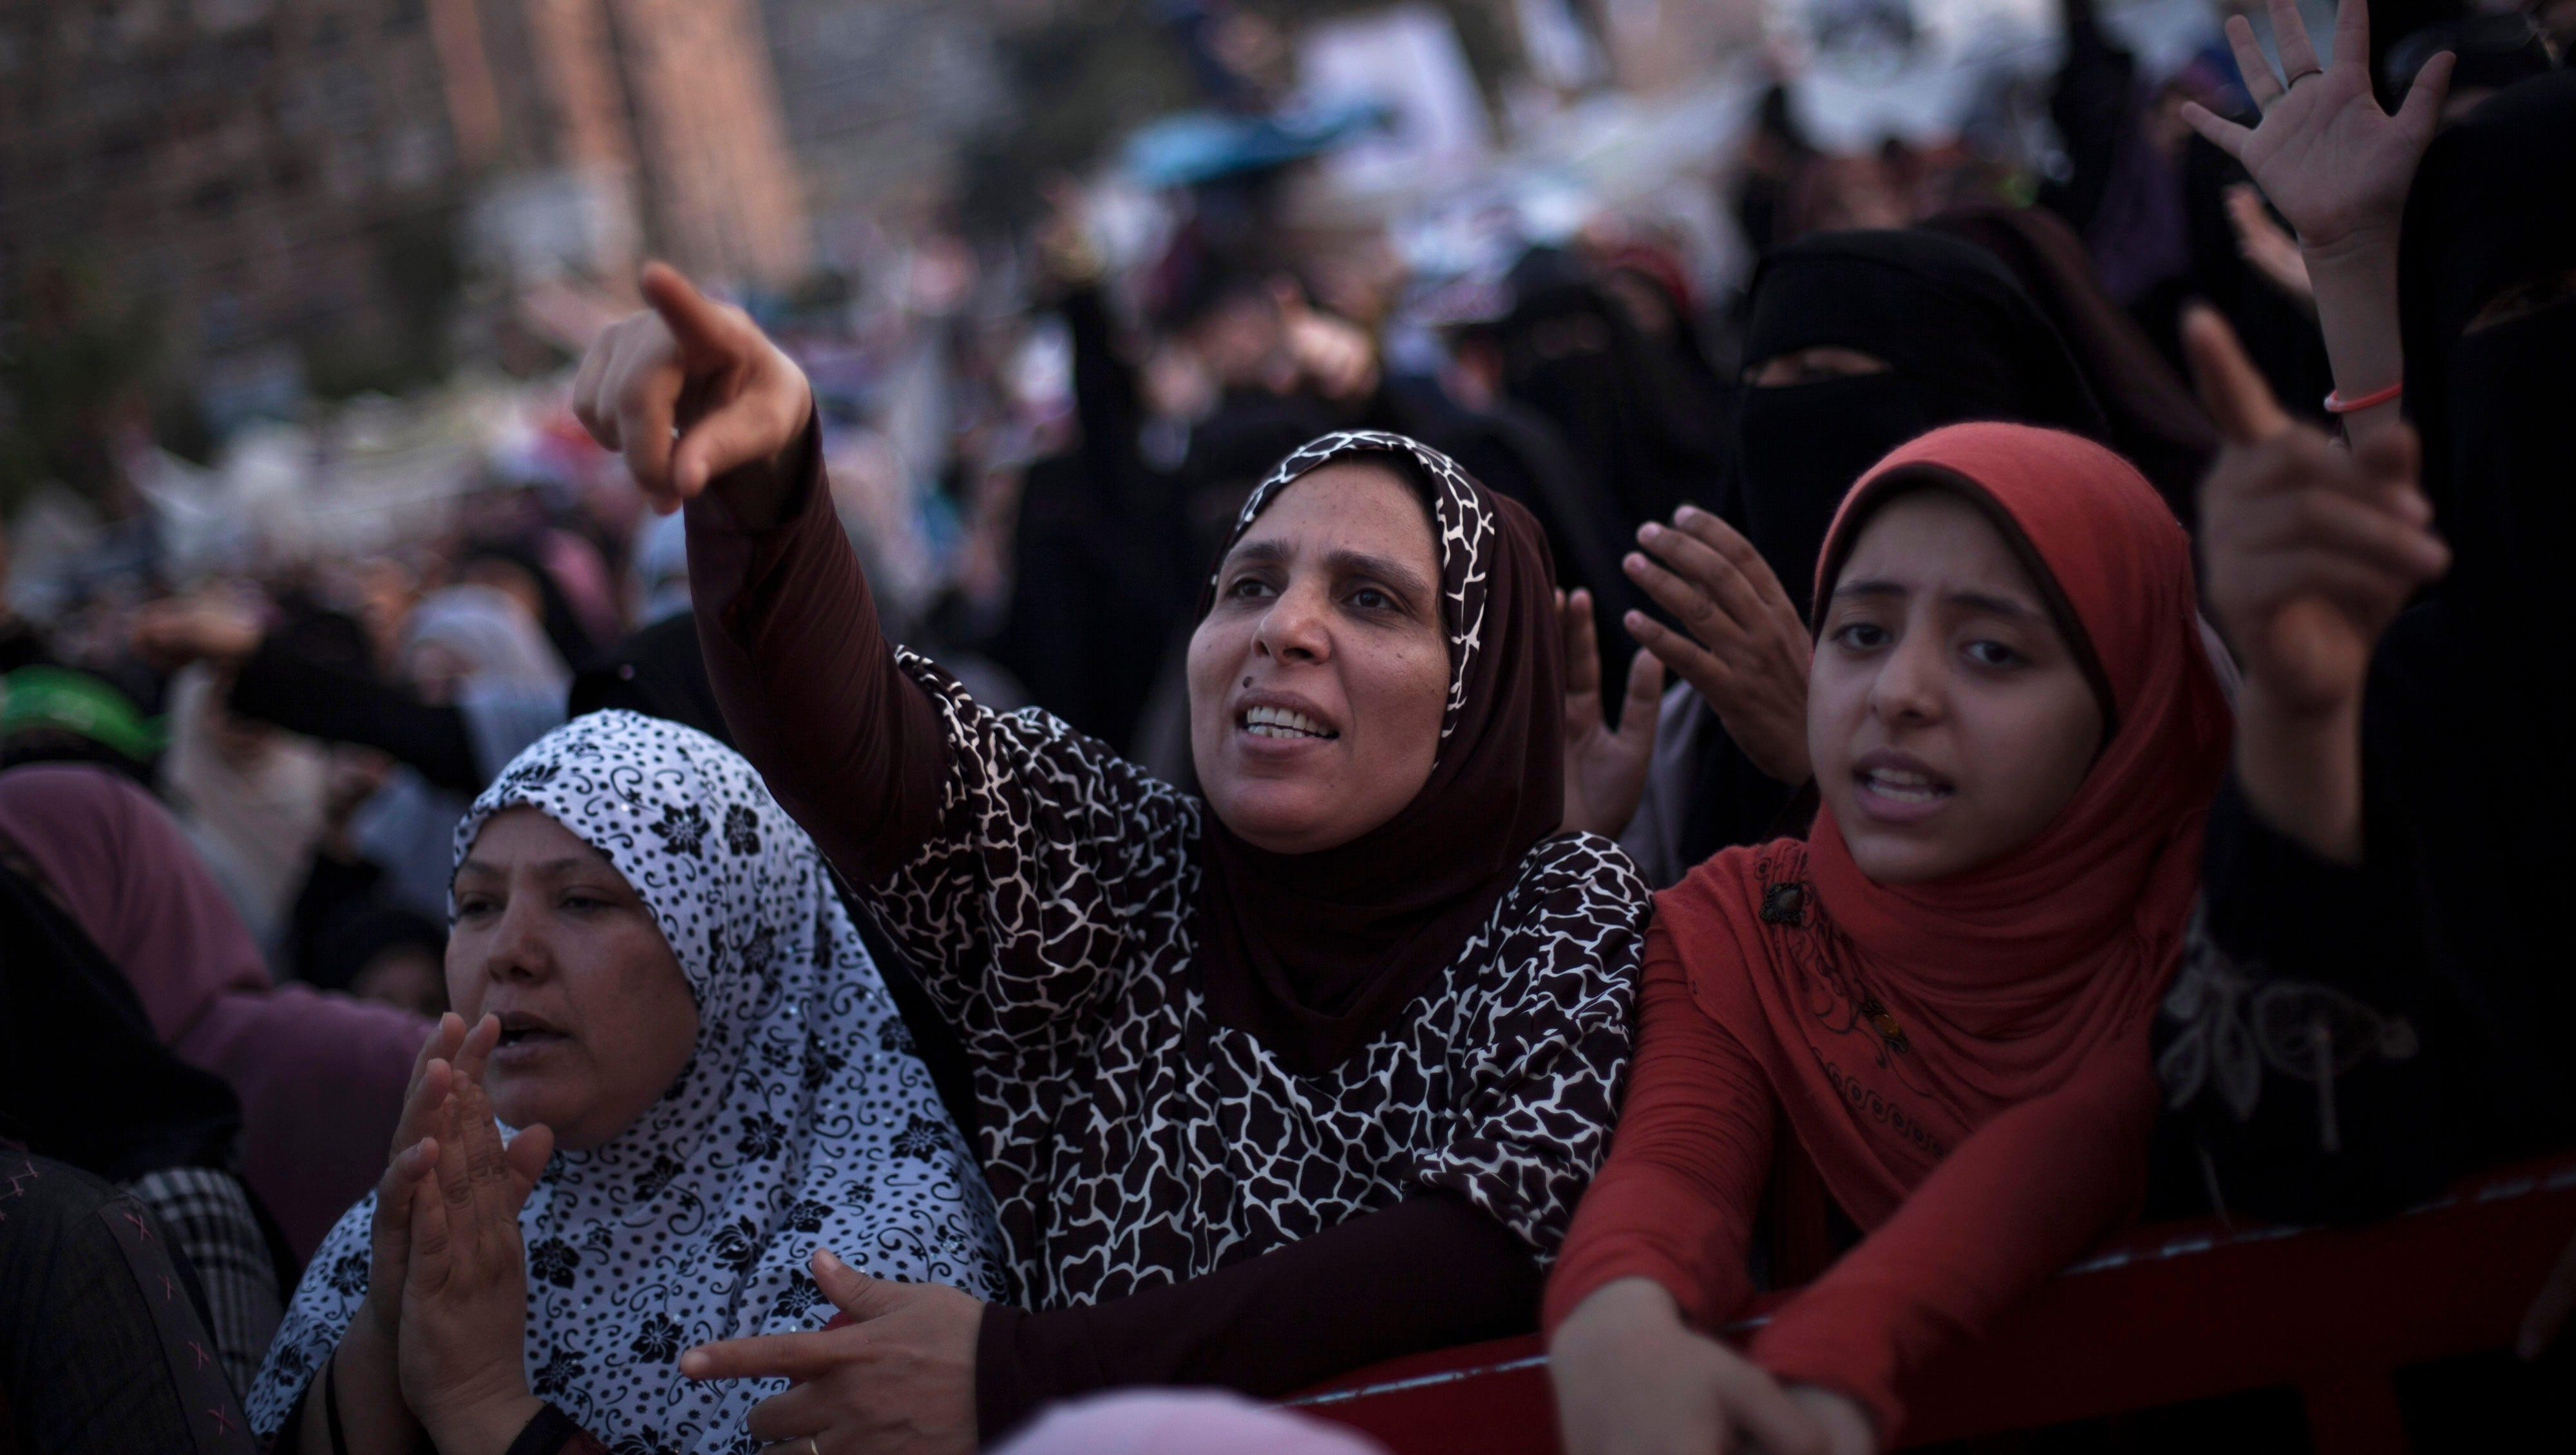 Morsi supporters chant slogans.